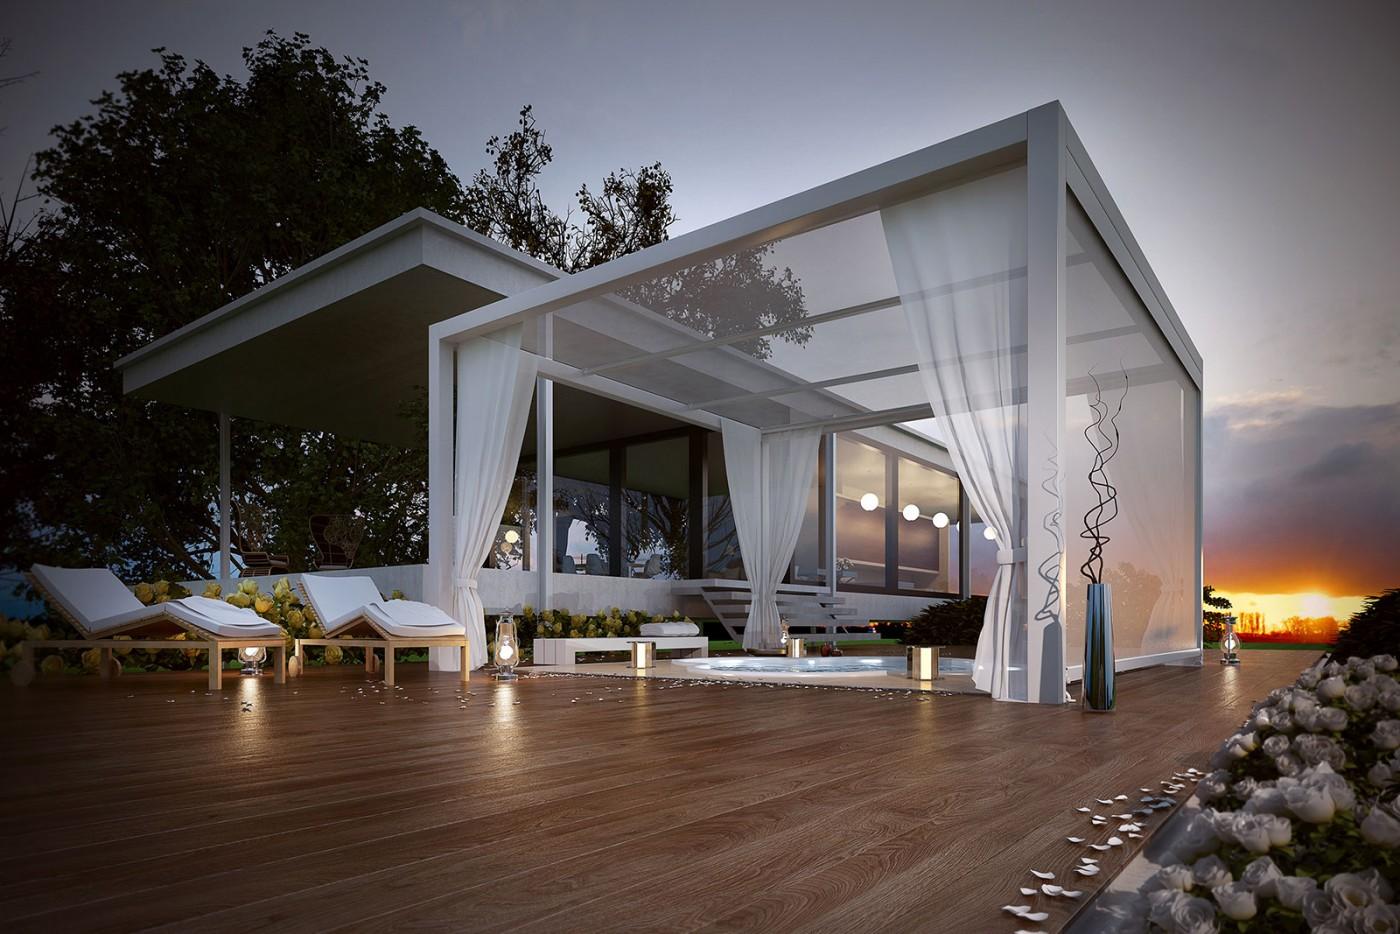 Un design moderno ed essenziale…